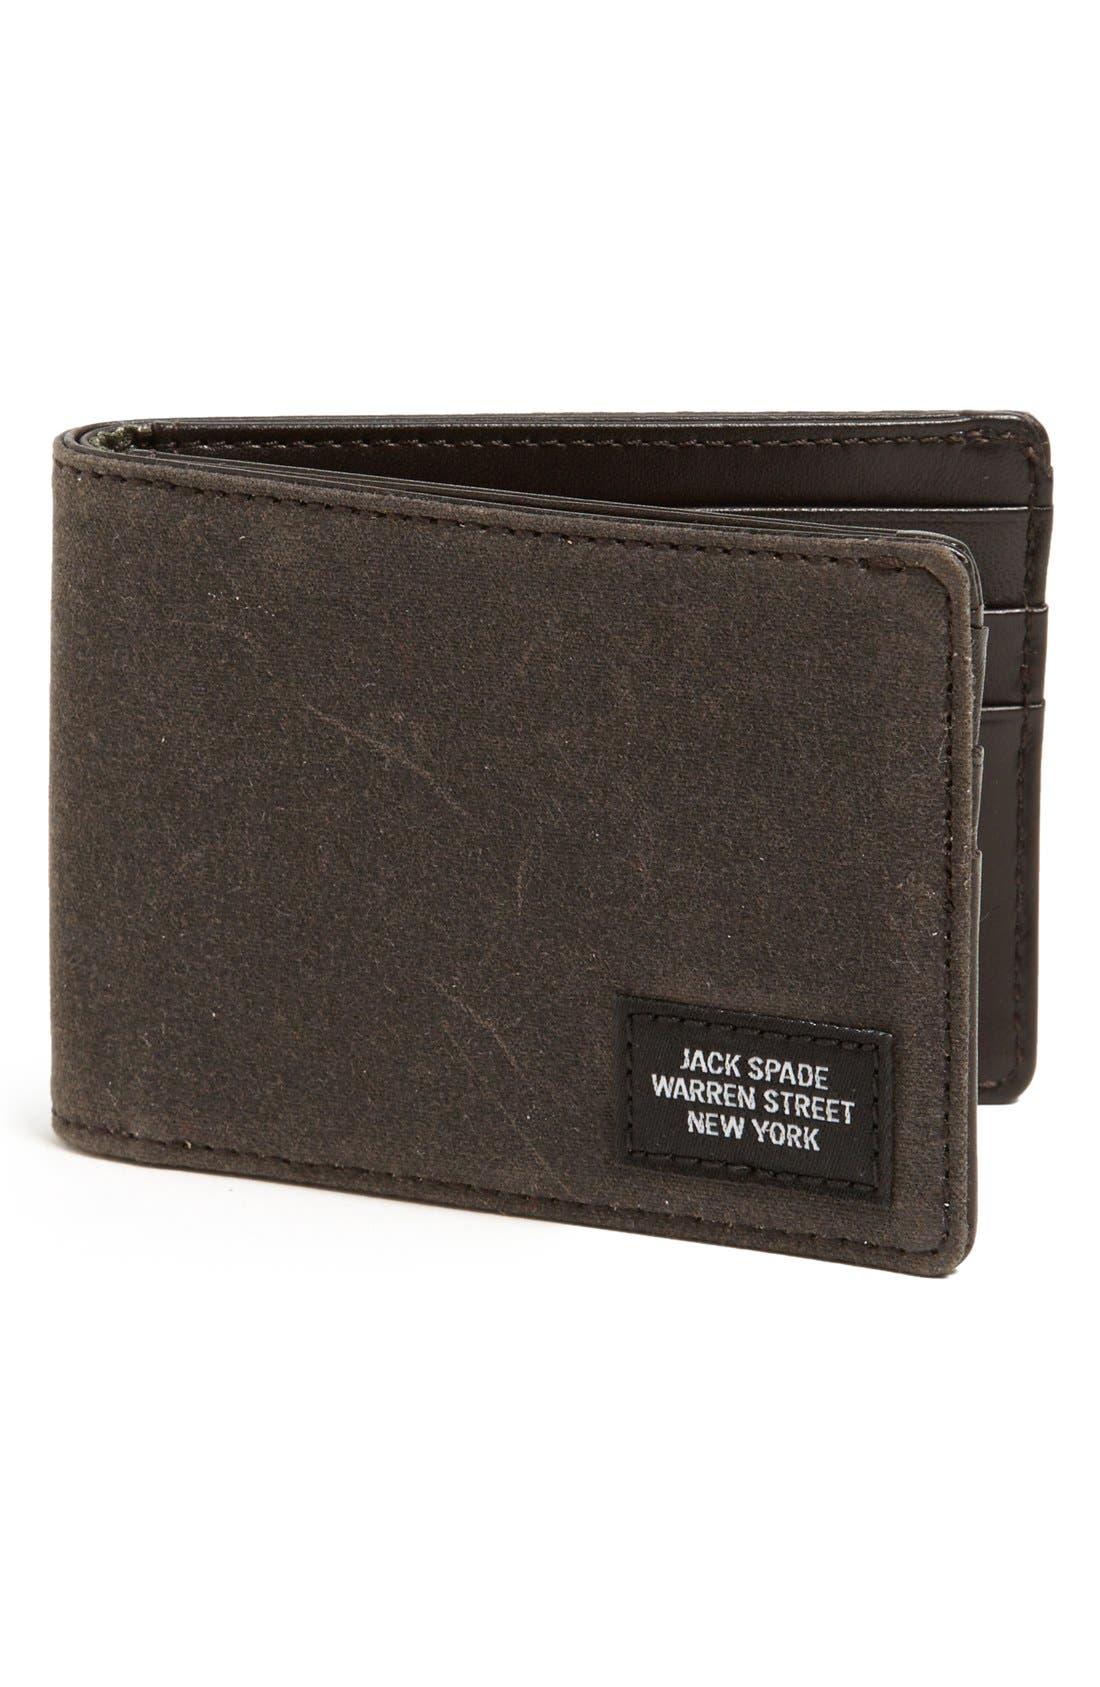 Main Image - Jack Spade 'Waxwear' Wallet